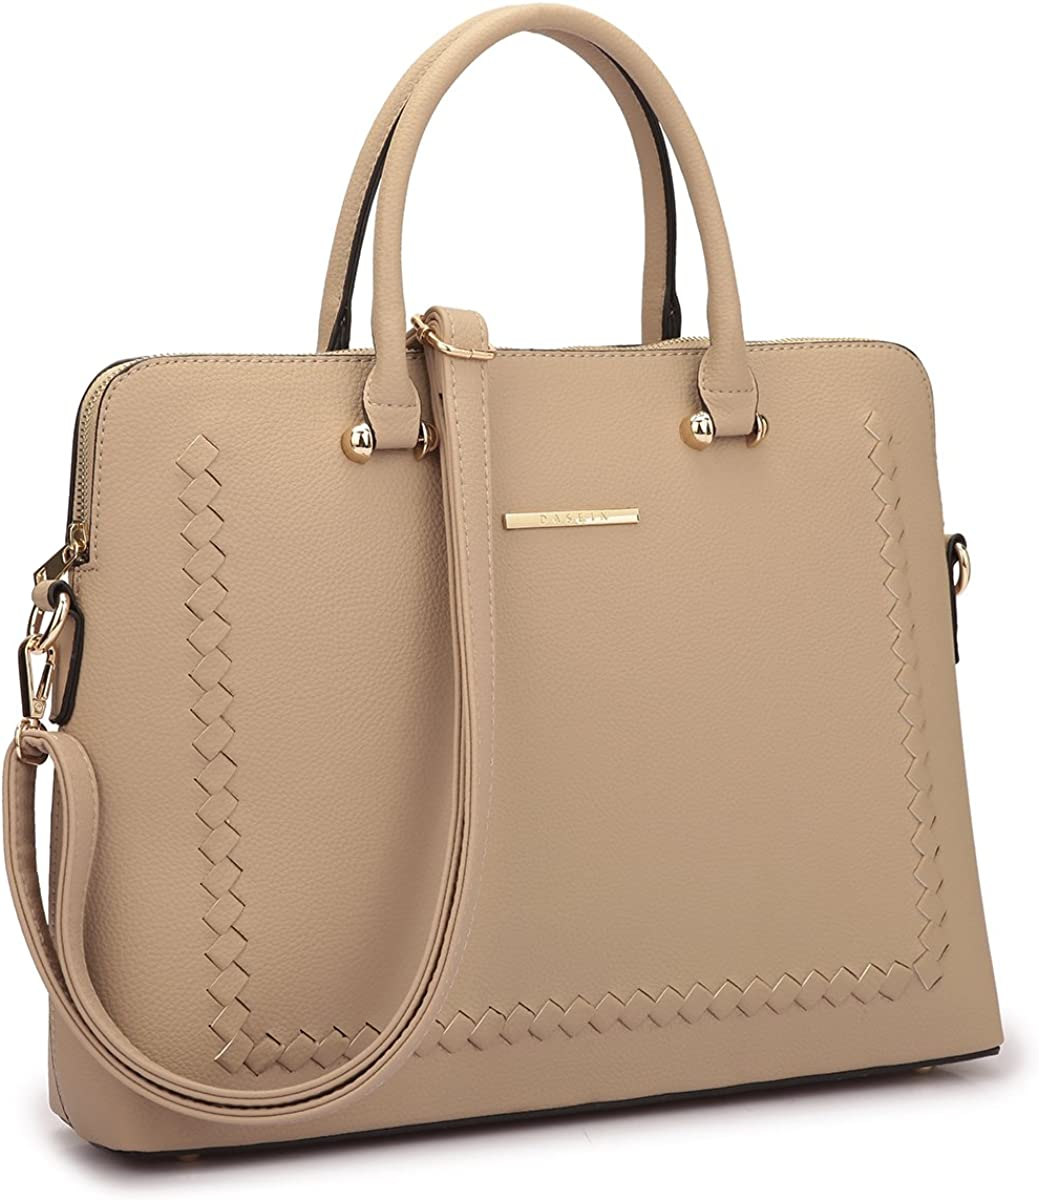 Handbags for Women Large Top Handle Satchel Purse Work Office Tote Shoulder Bag